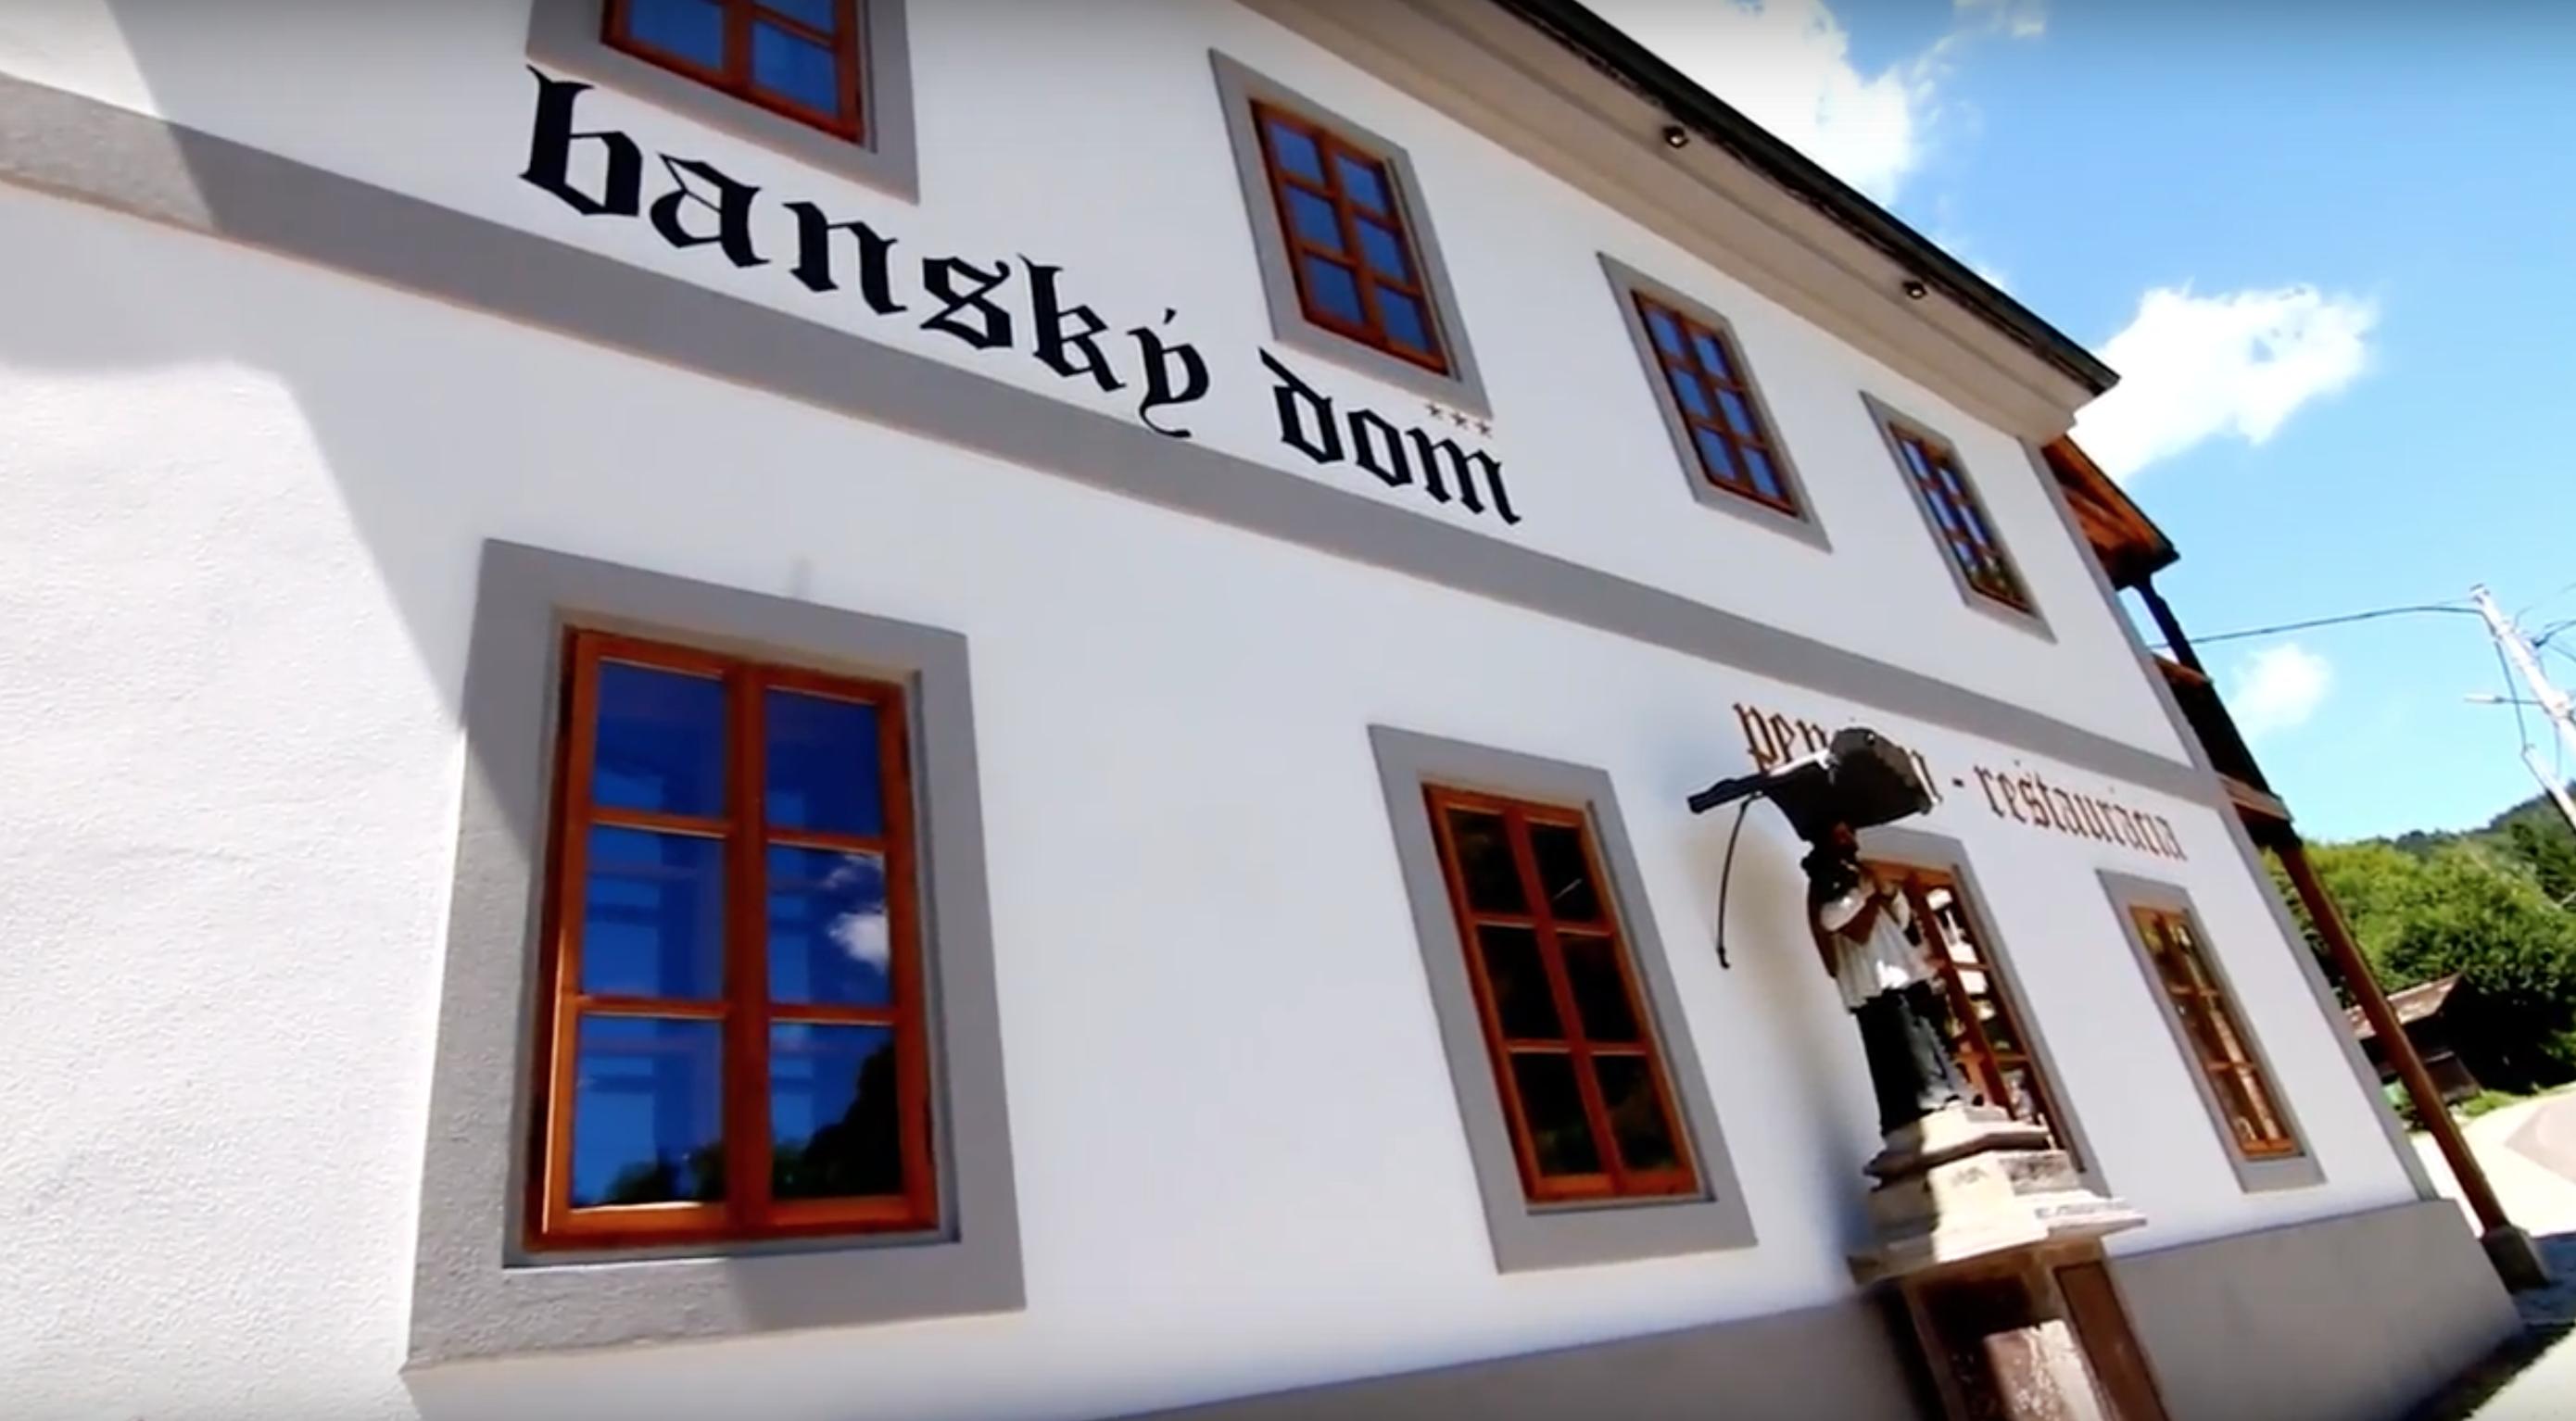 Bansky dom